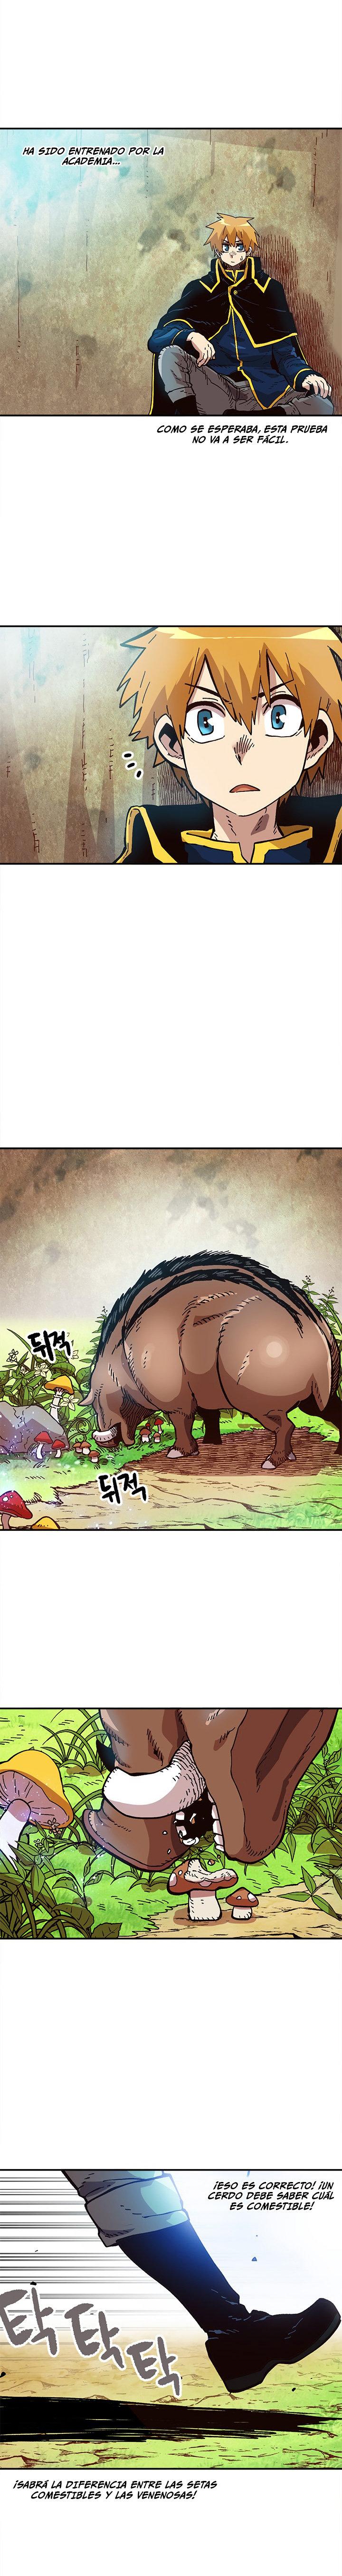 https://nine.mangadogs.com/es_manga/pic9/15/35919/969366/9f460e30429cf3337216a4aab752994c.jpg Page 19